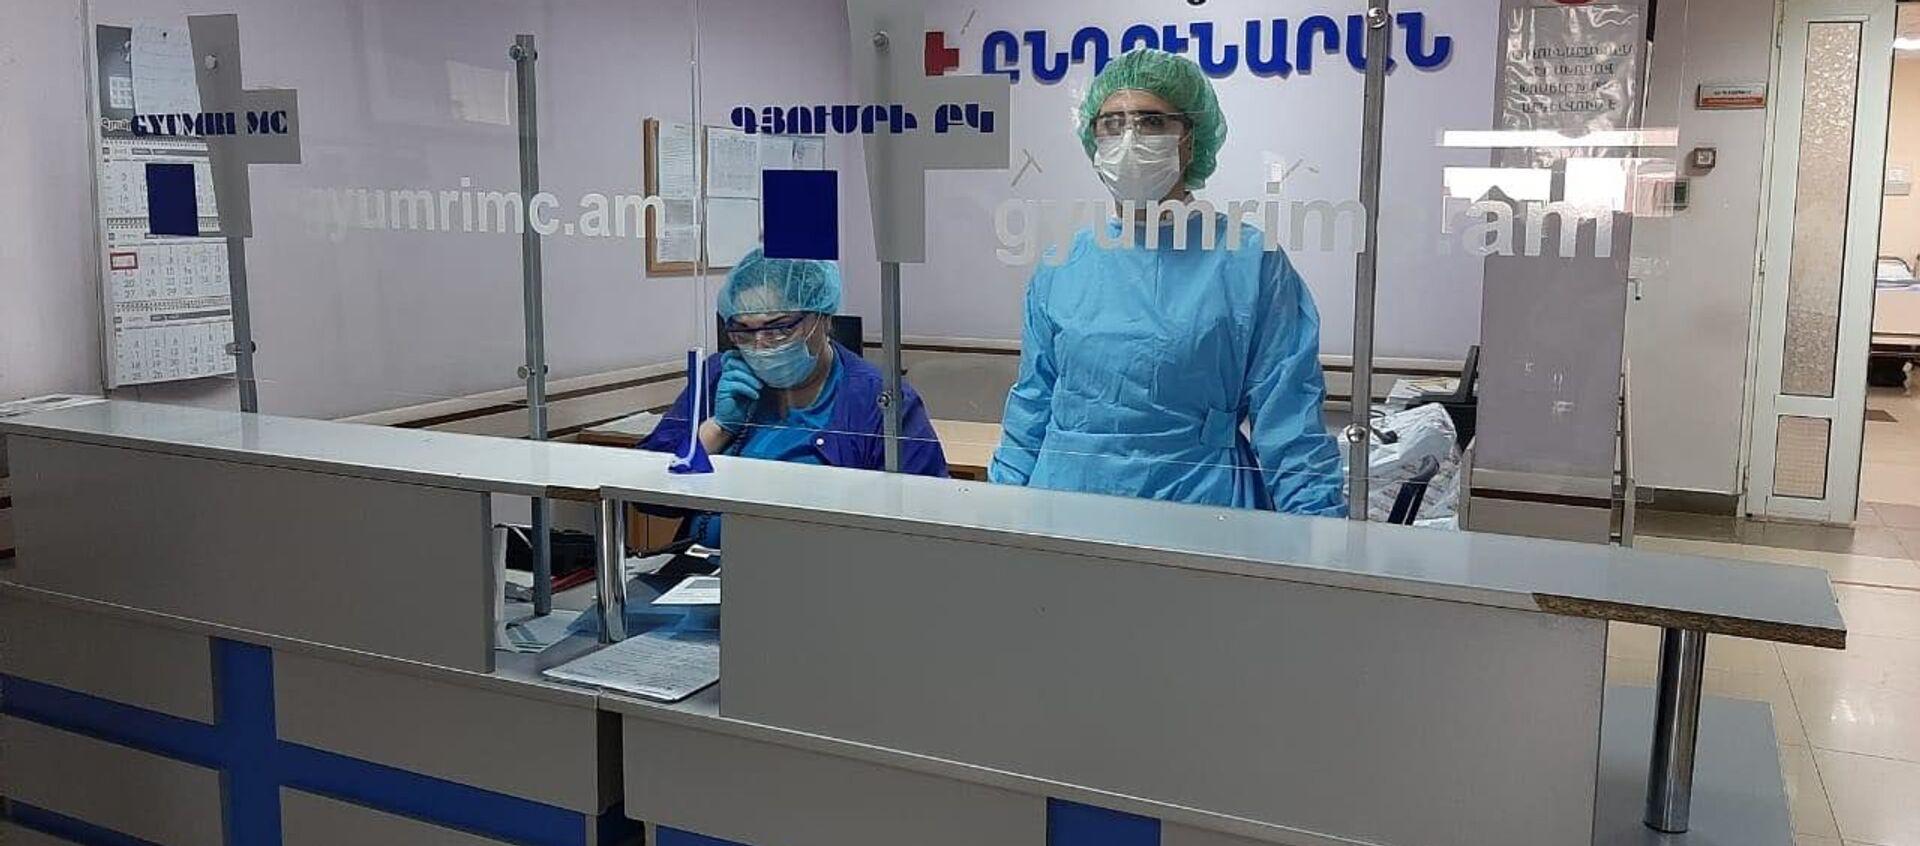 Медицинский центр Гюмри (6 апреля 2020). Гюмри - Sputnik Армения, 1920, 05.07.2021